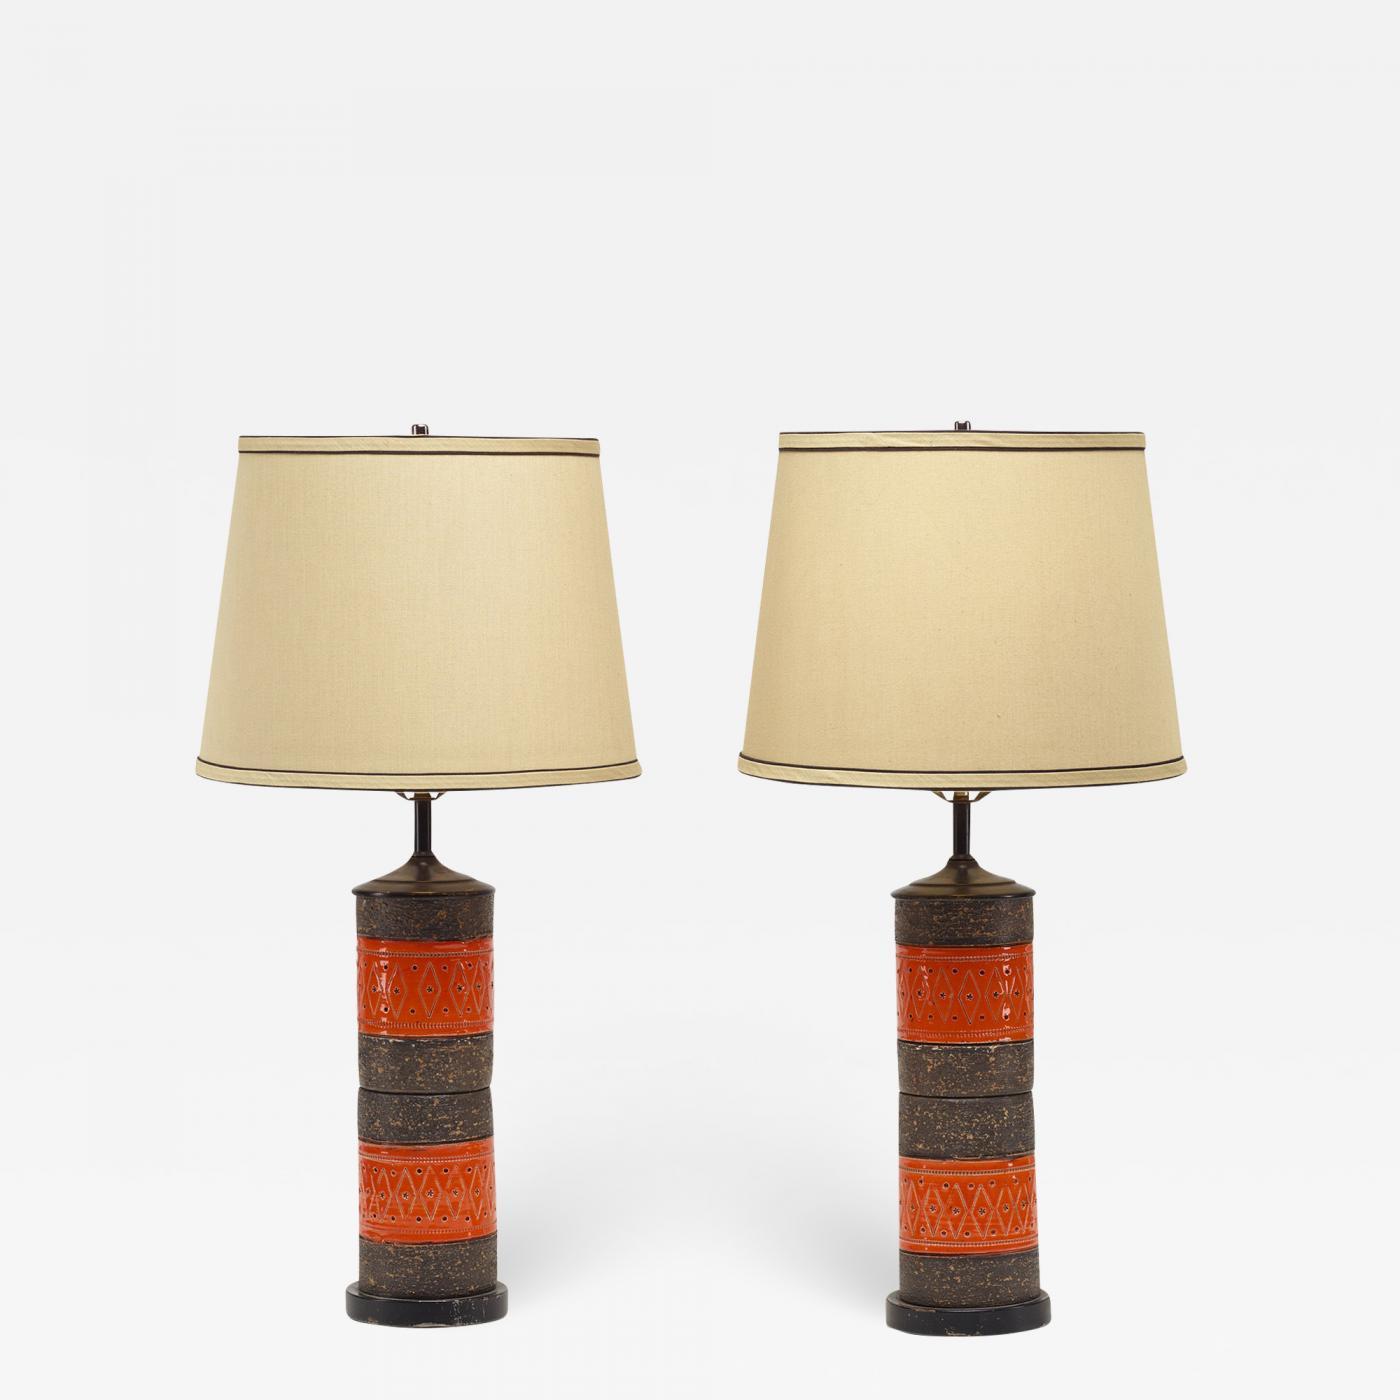 Bon Listings / Furniture / Lighting / Table Lamps